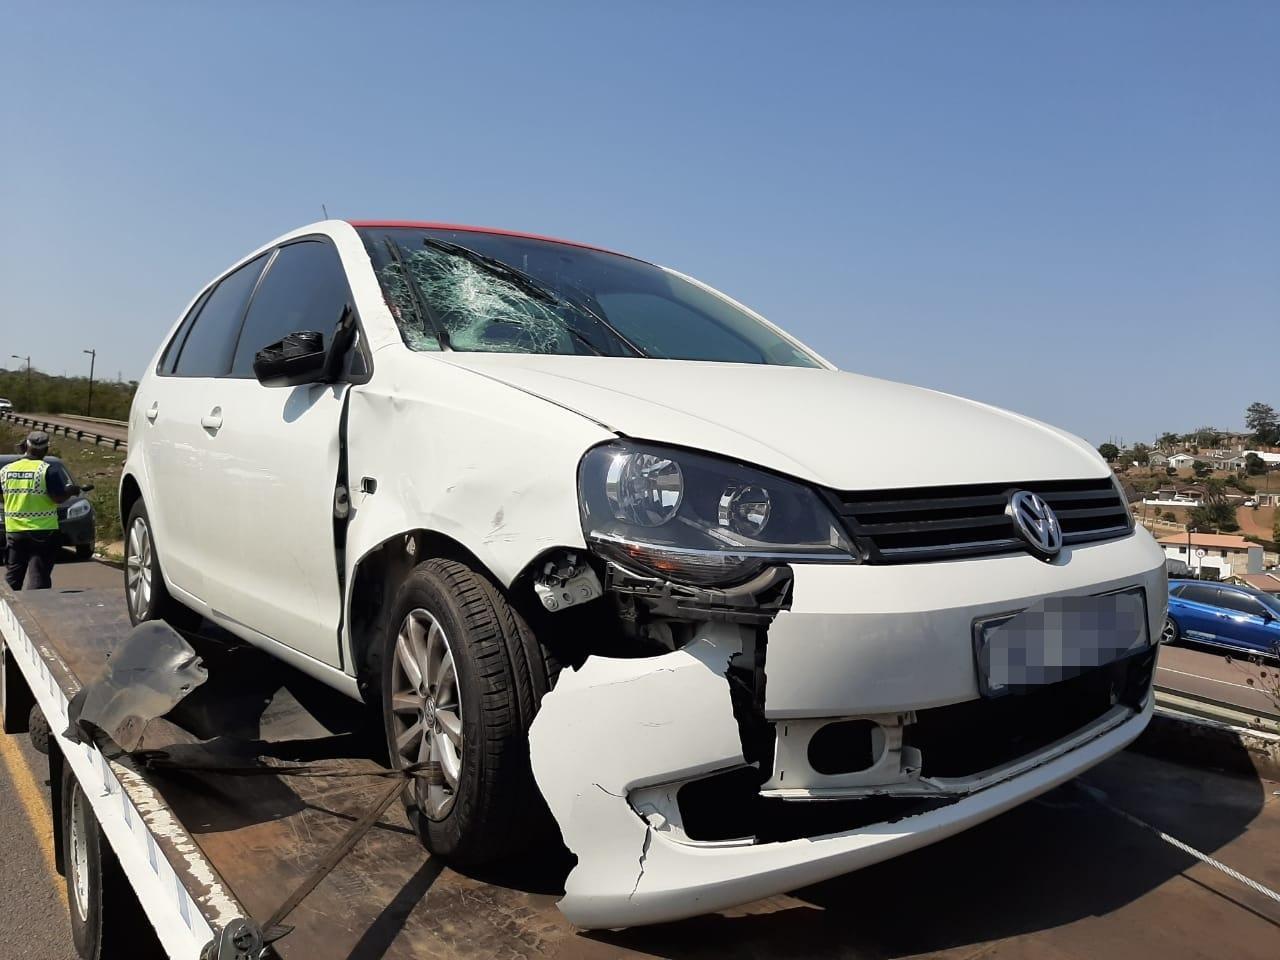 Pedestrian Killed on the R102 at Verulam, KZN